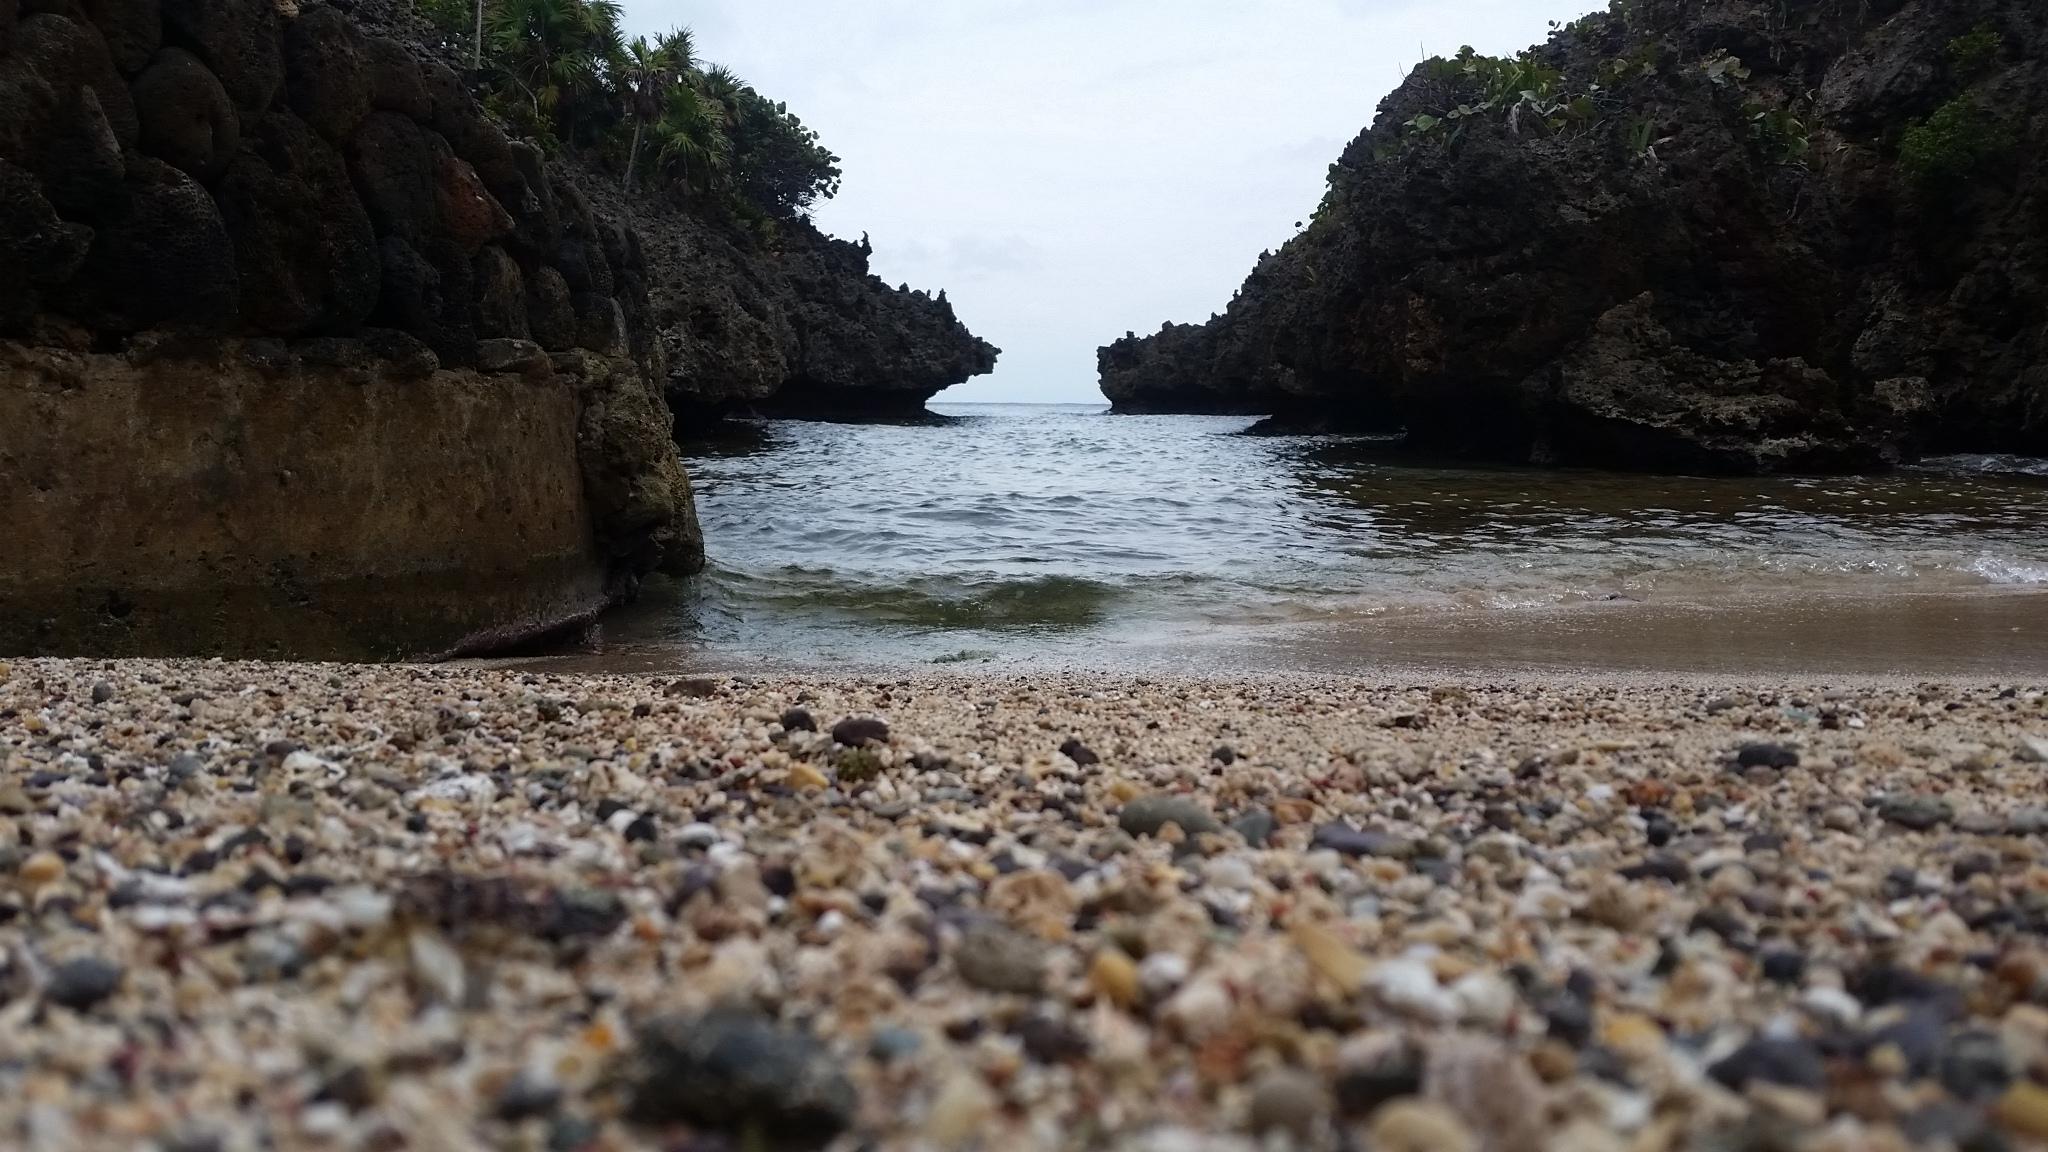 Beach 4-3 Keyhole Bay, West Bay, Roatan, Honduras